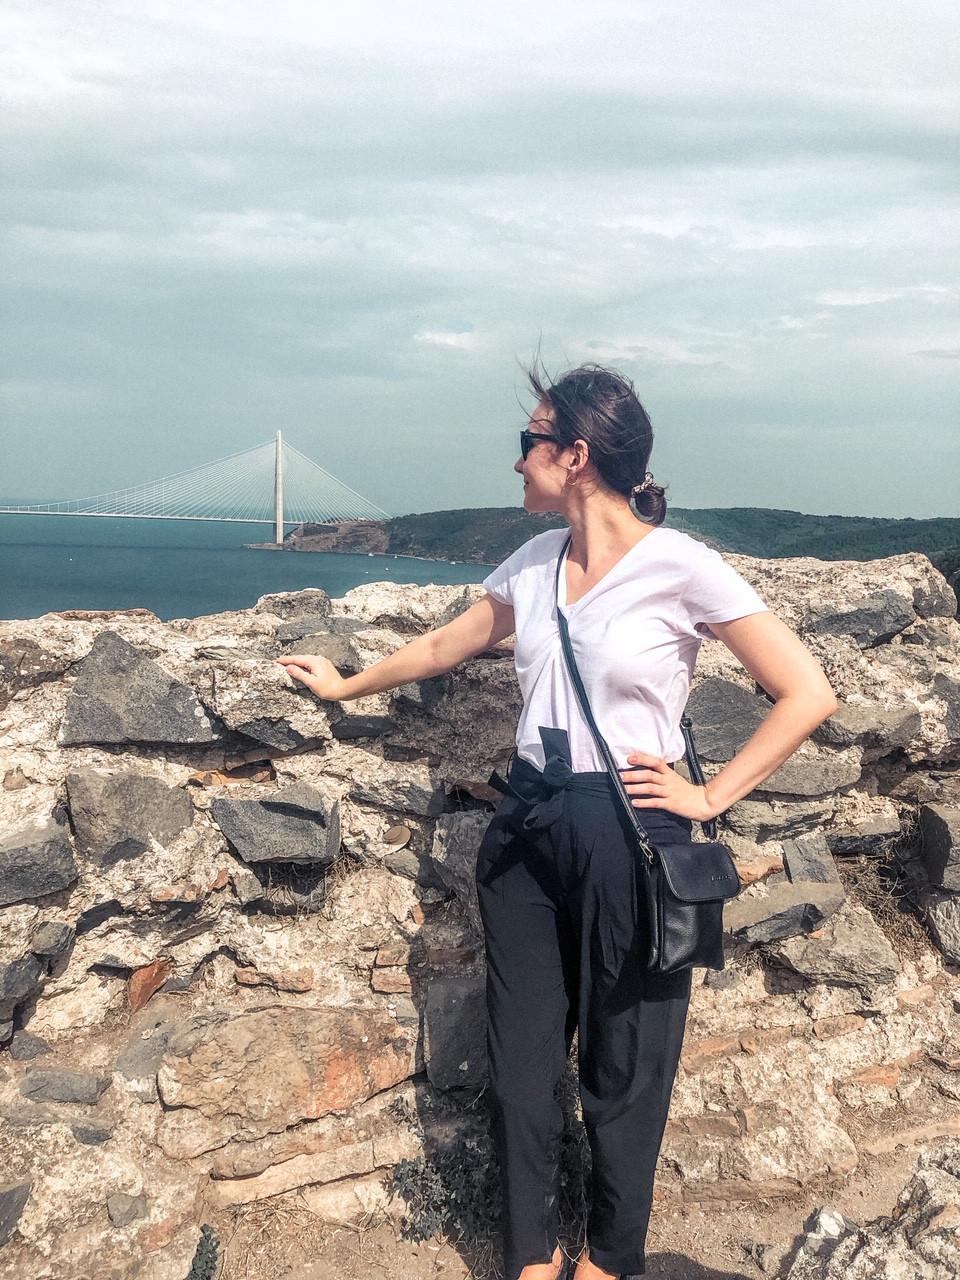 Jenna overlooking the Bosphorus and Black Sea